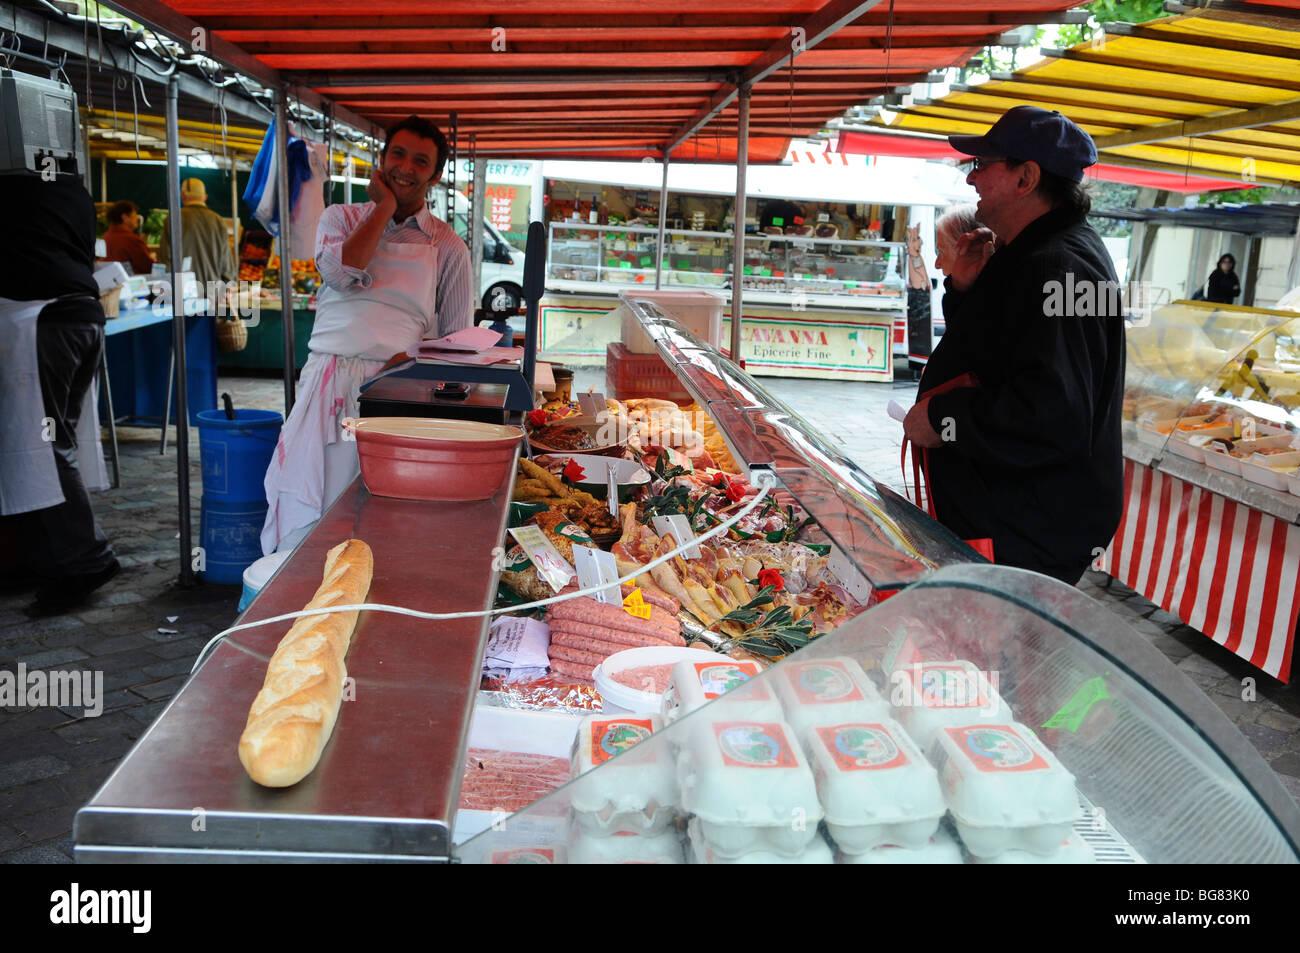 France paris an outdoor street food market a butcher for Outdoor food market